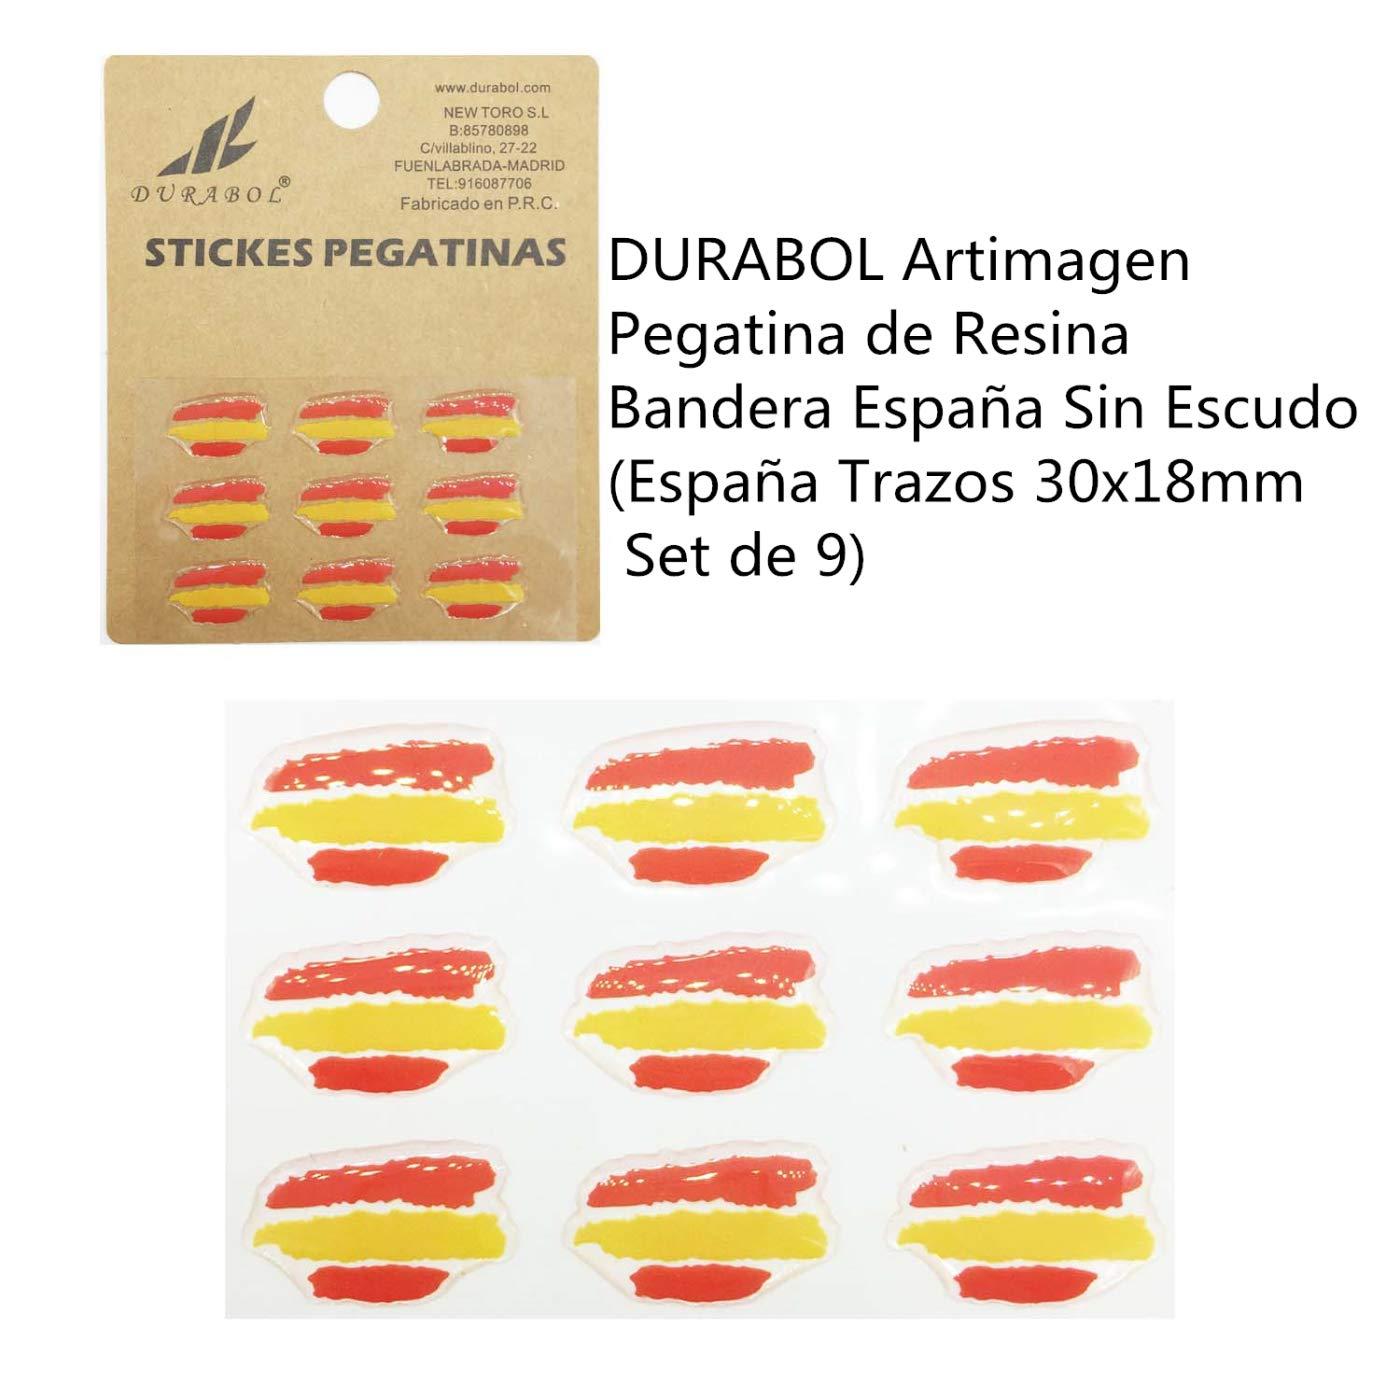 Espa/ña Trazos 30x18mm Set de 9 DURABOL Artimagen Pegatina de Resina Bandera Espa/ña Sin Escudo